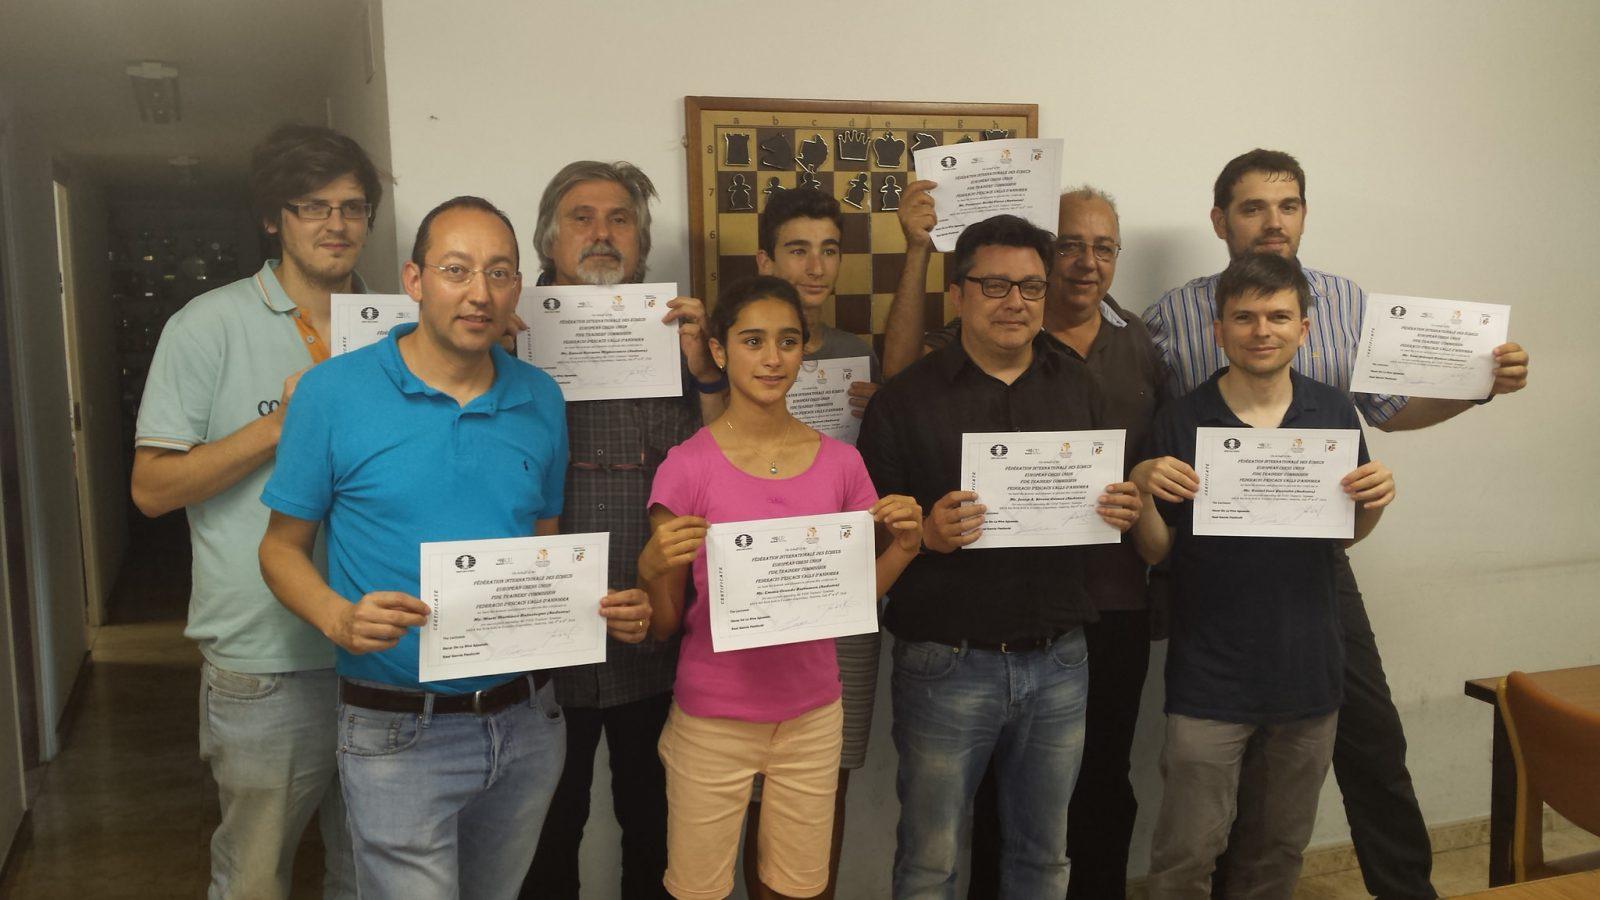 FIDE Trainers' Seminar – Crònica